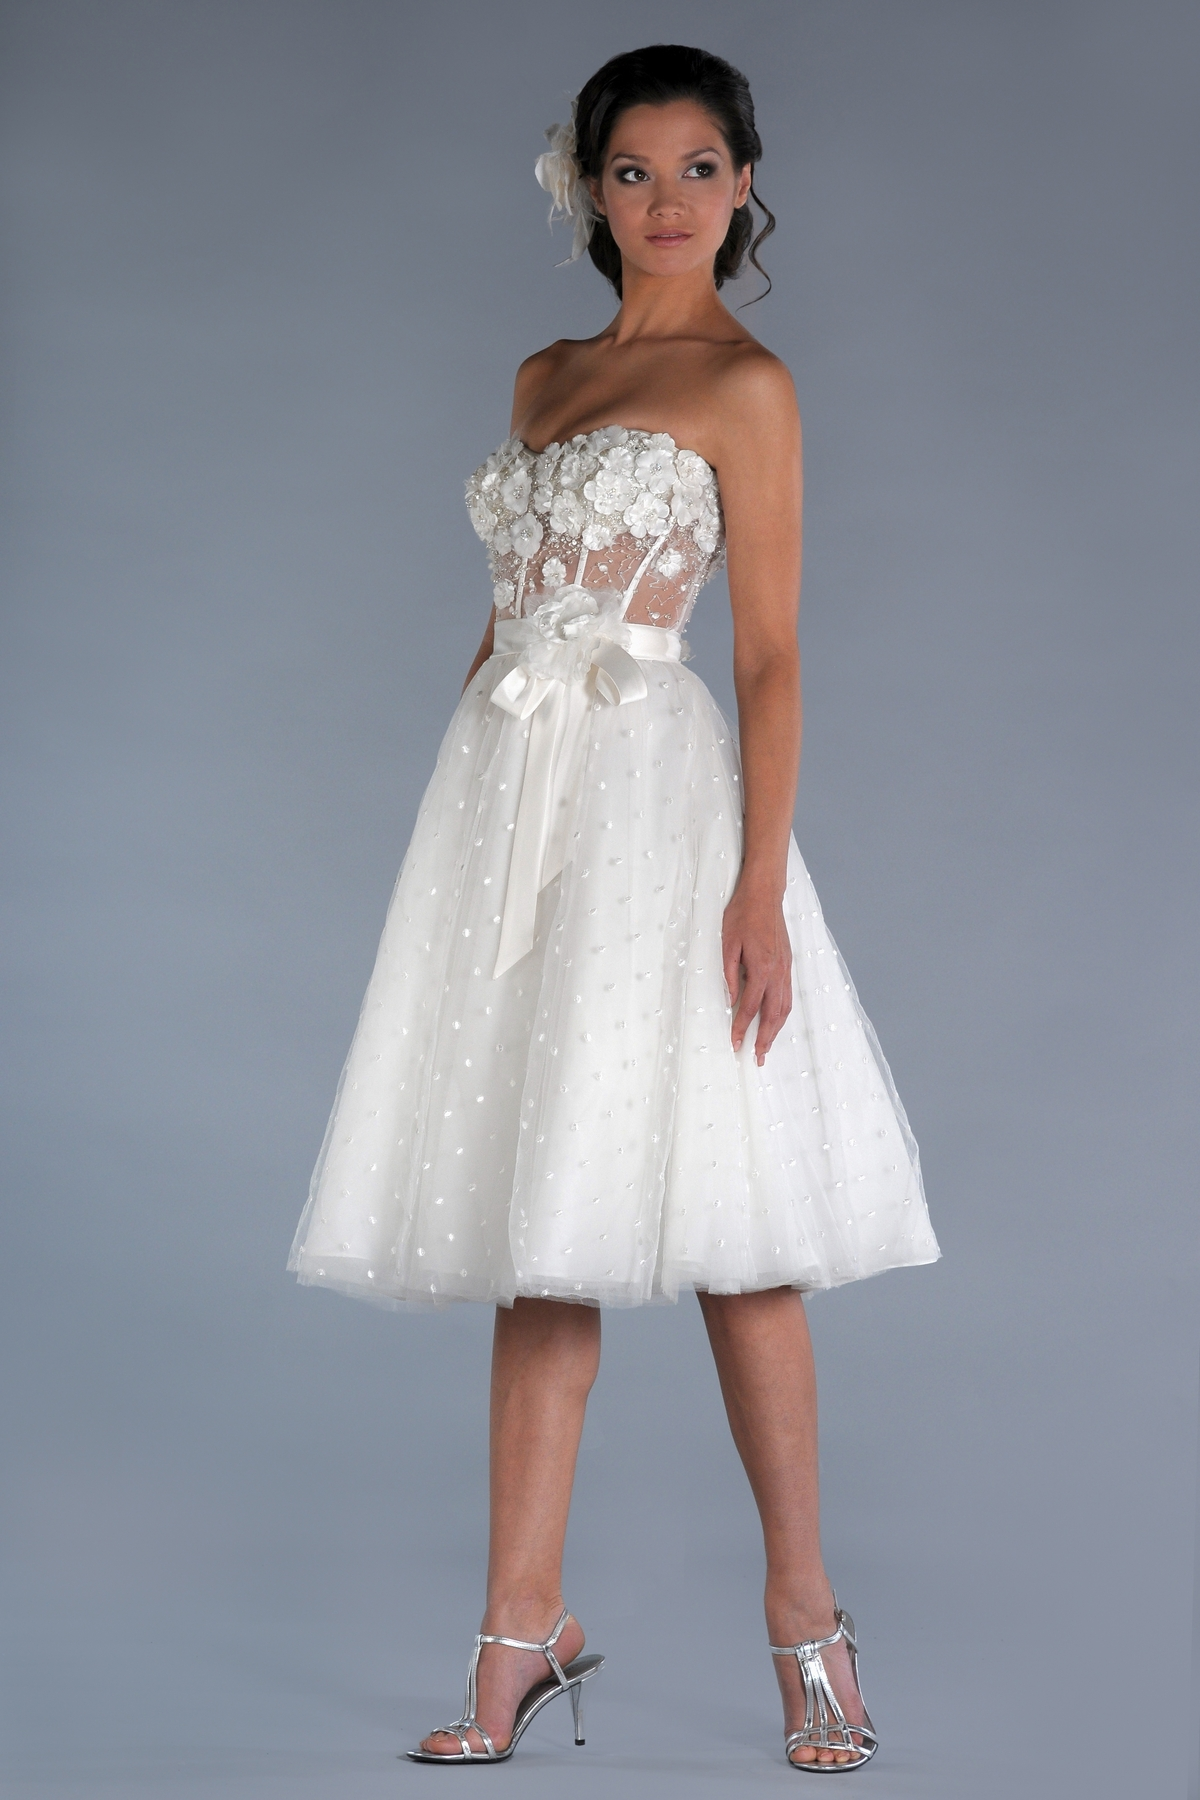 Short wedding dresses dressed up girl for Wedding girl dress up